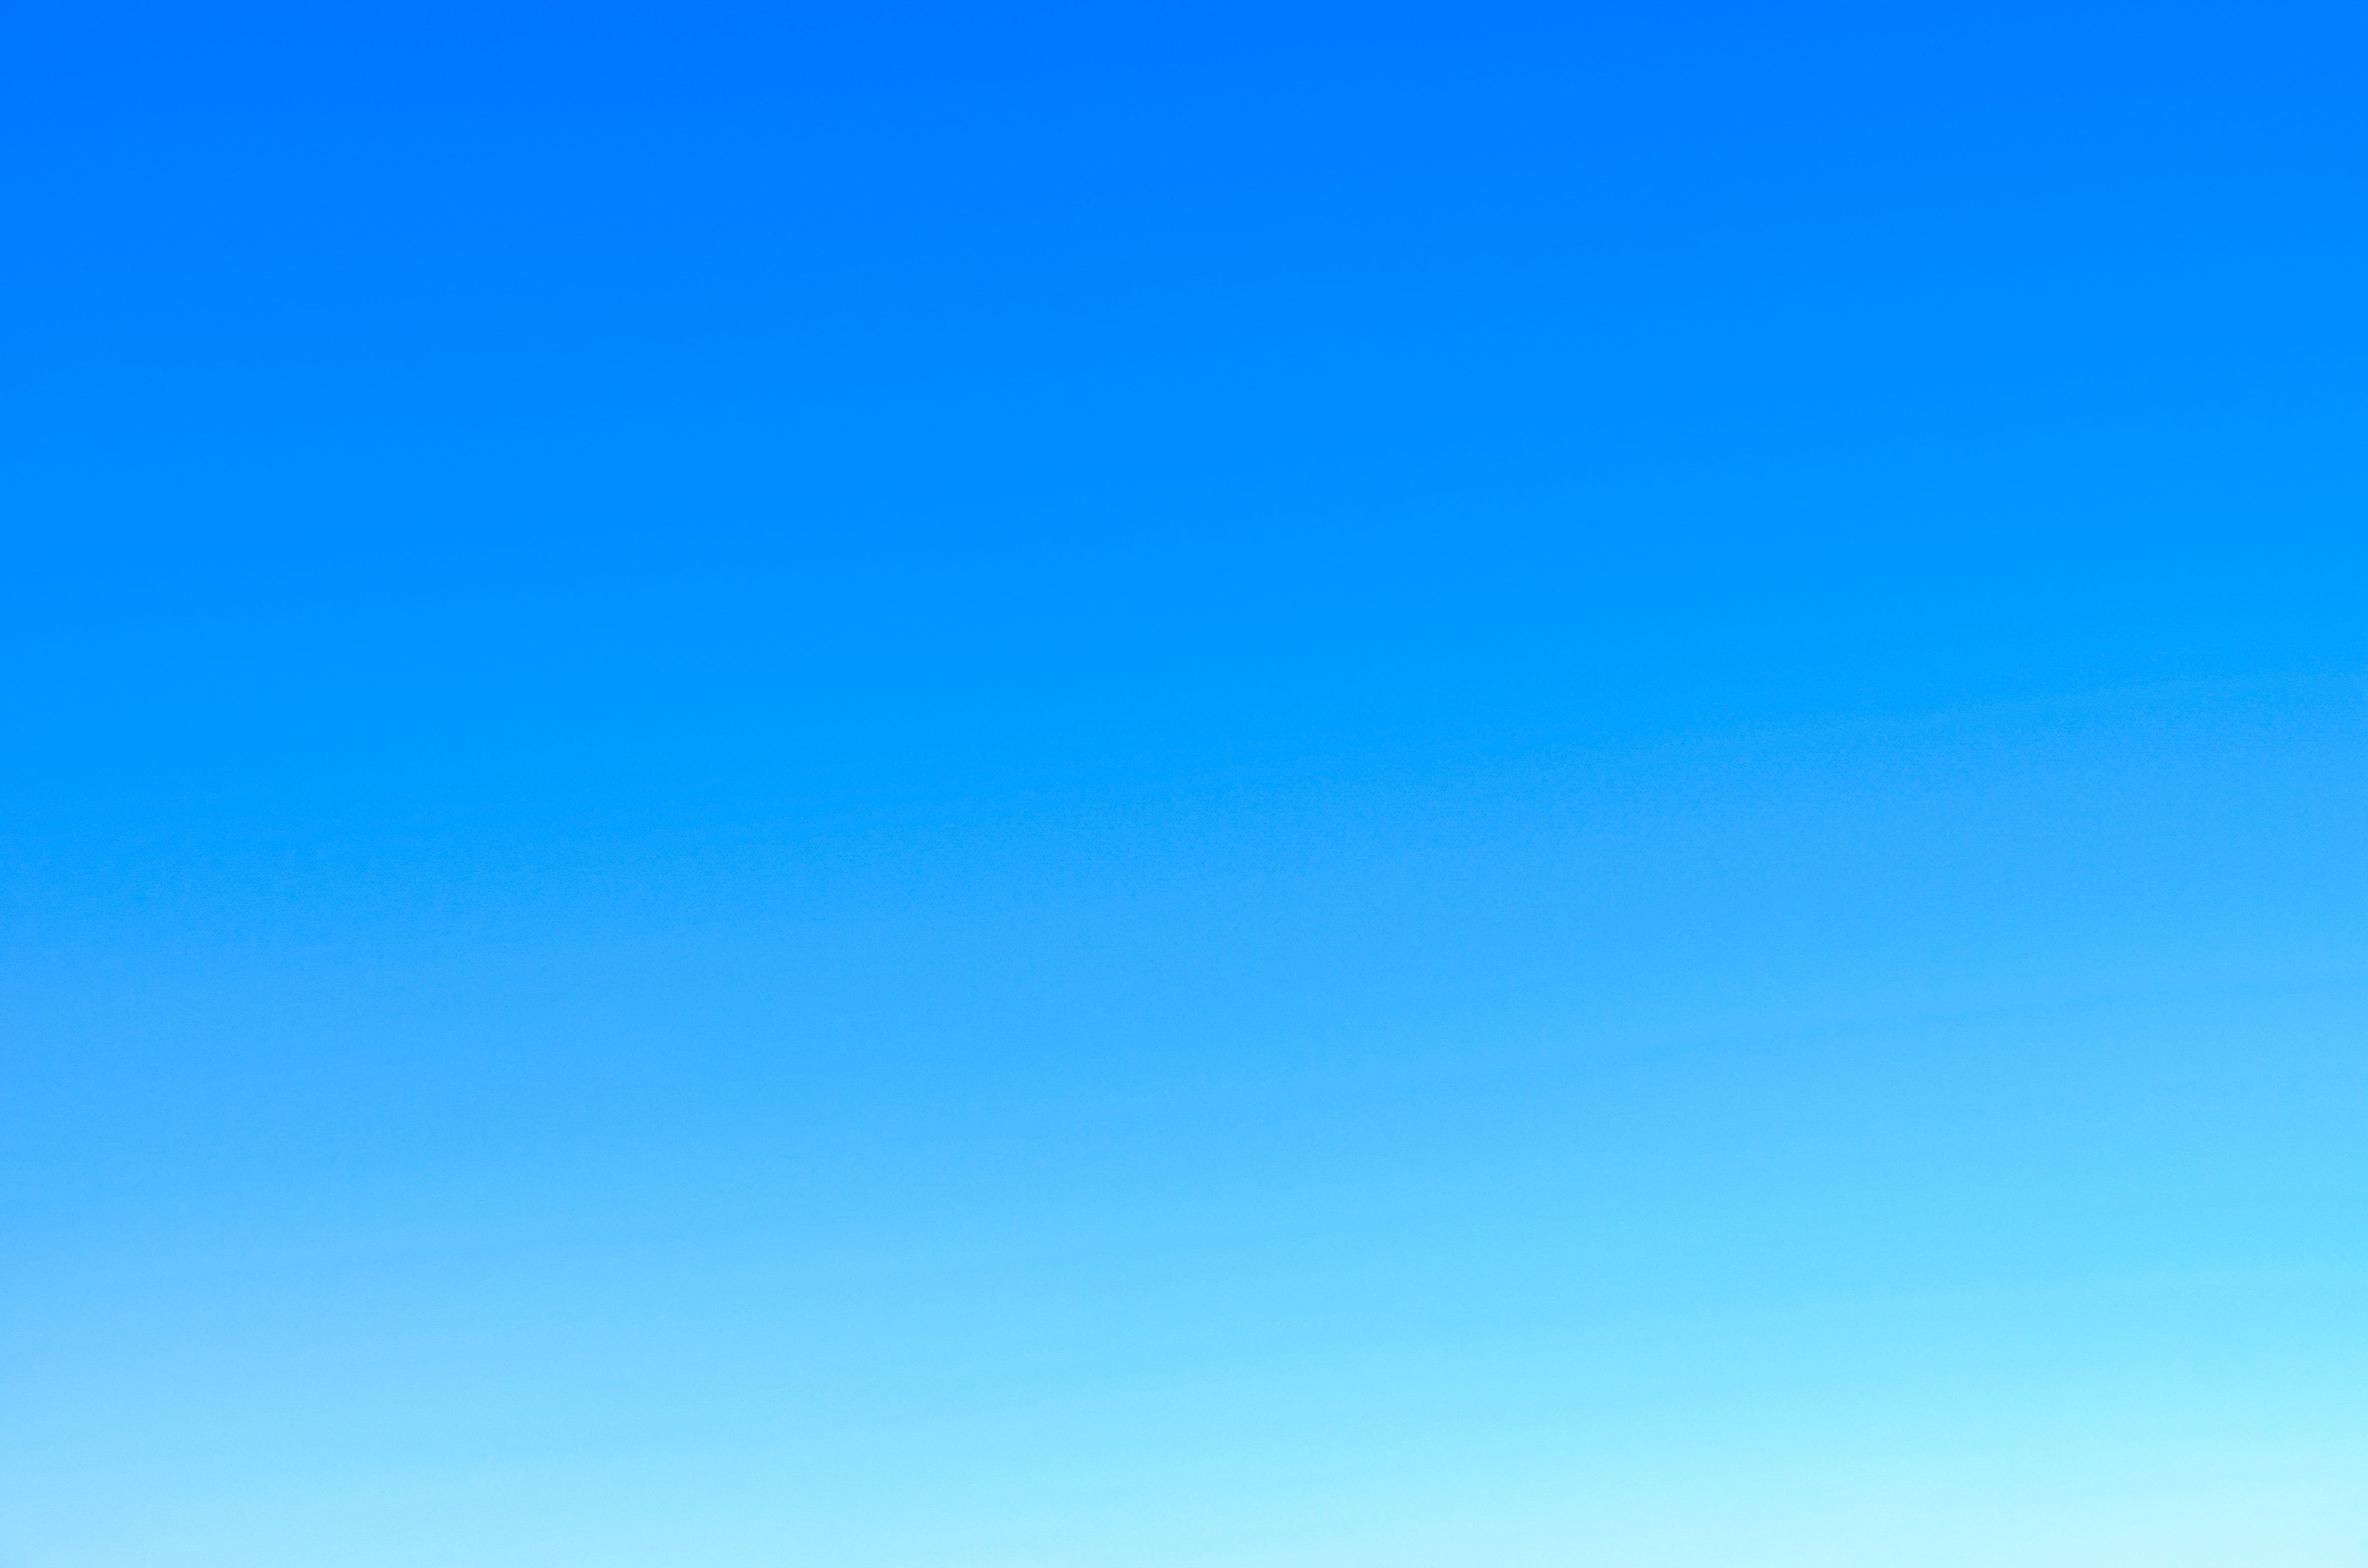 blue sky, blur, clear sky